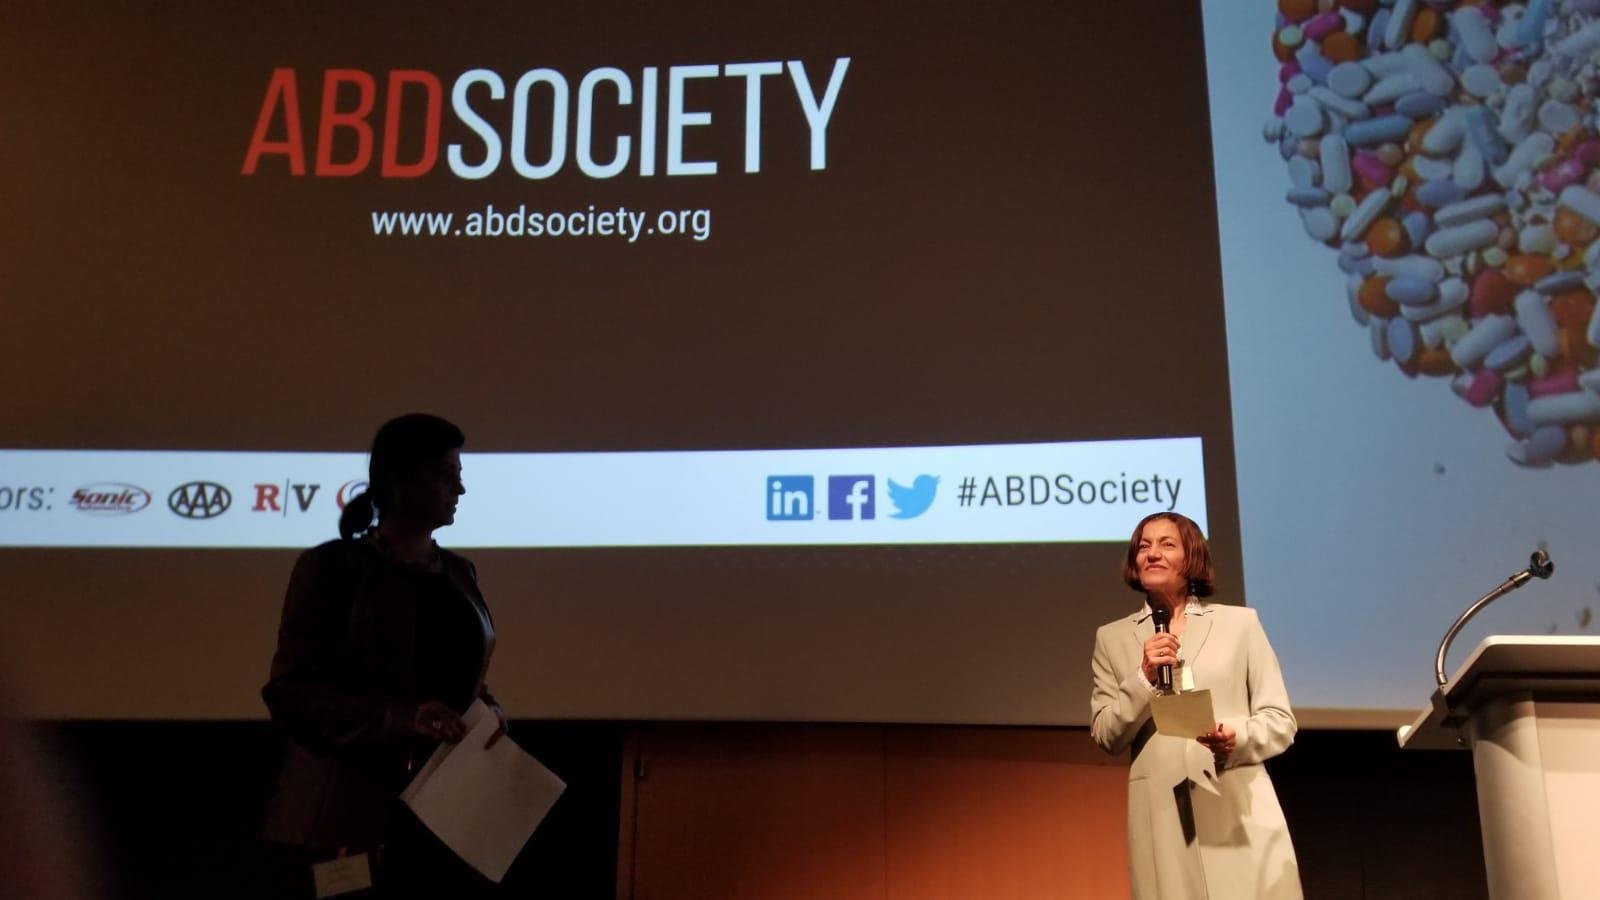 Fatma Milli introduces Social Good Speaker #2 - Shikha Kashyap